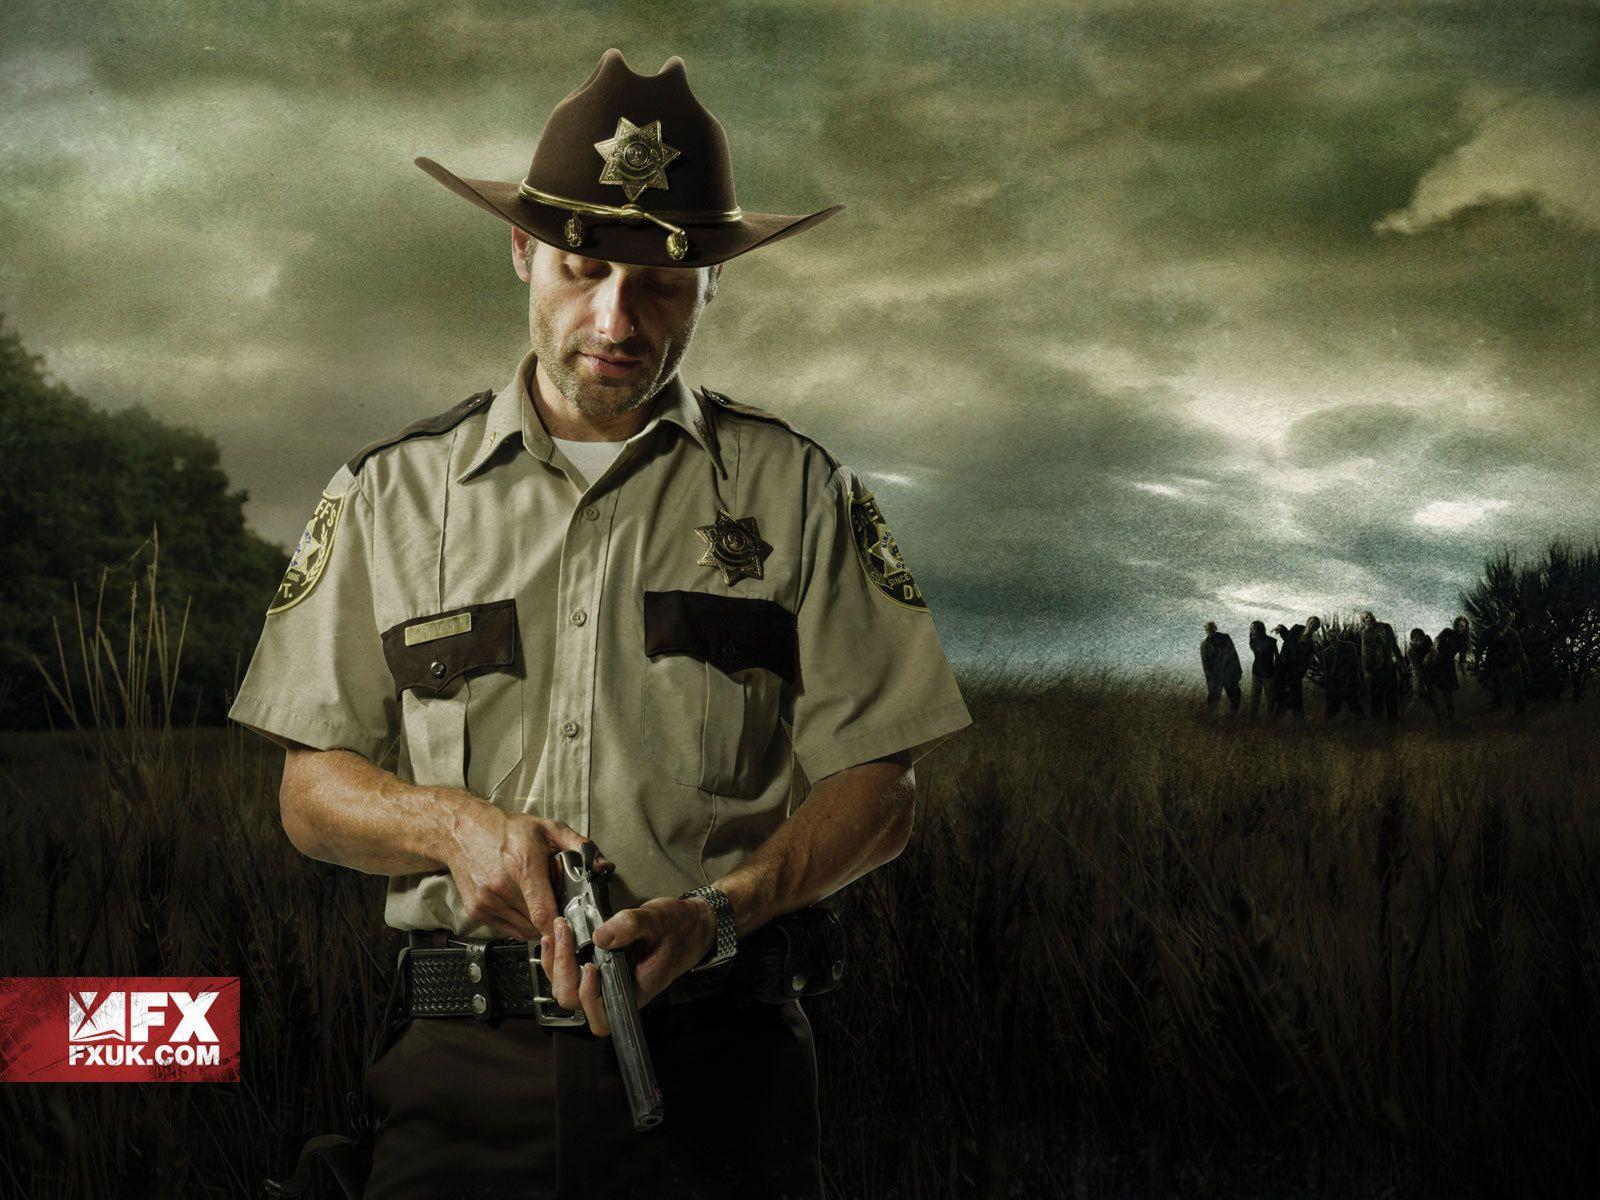 The Walking Dead Rick Grimes Sheriff Uniform Season 1 Lori